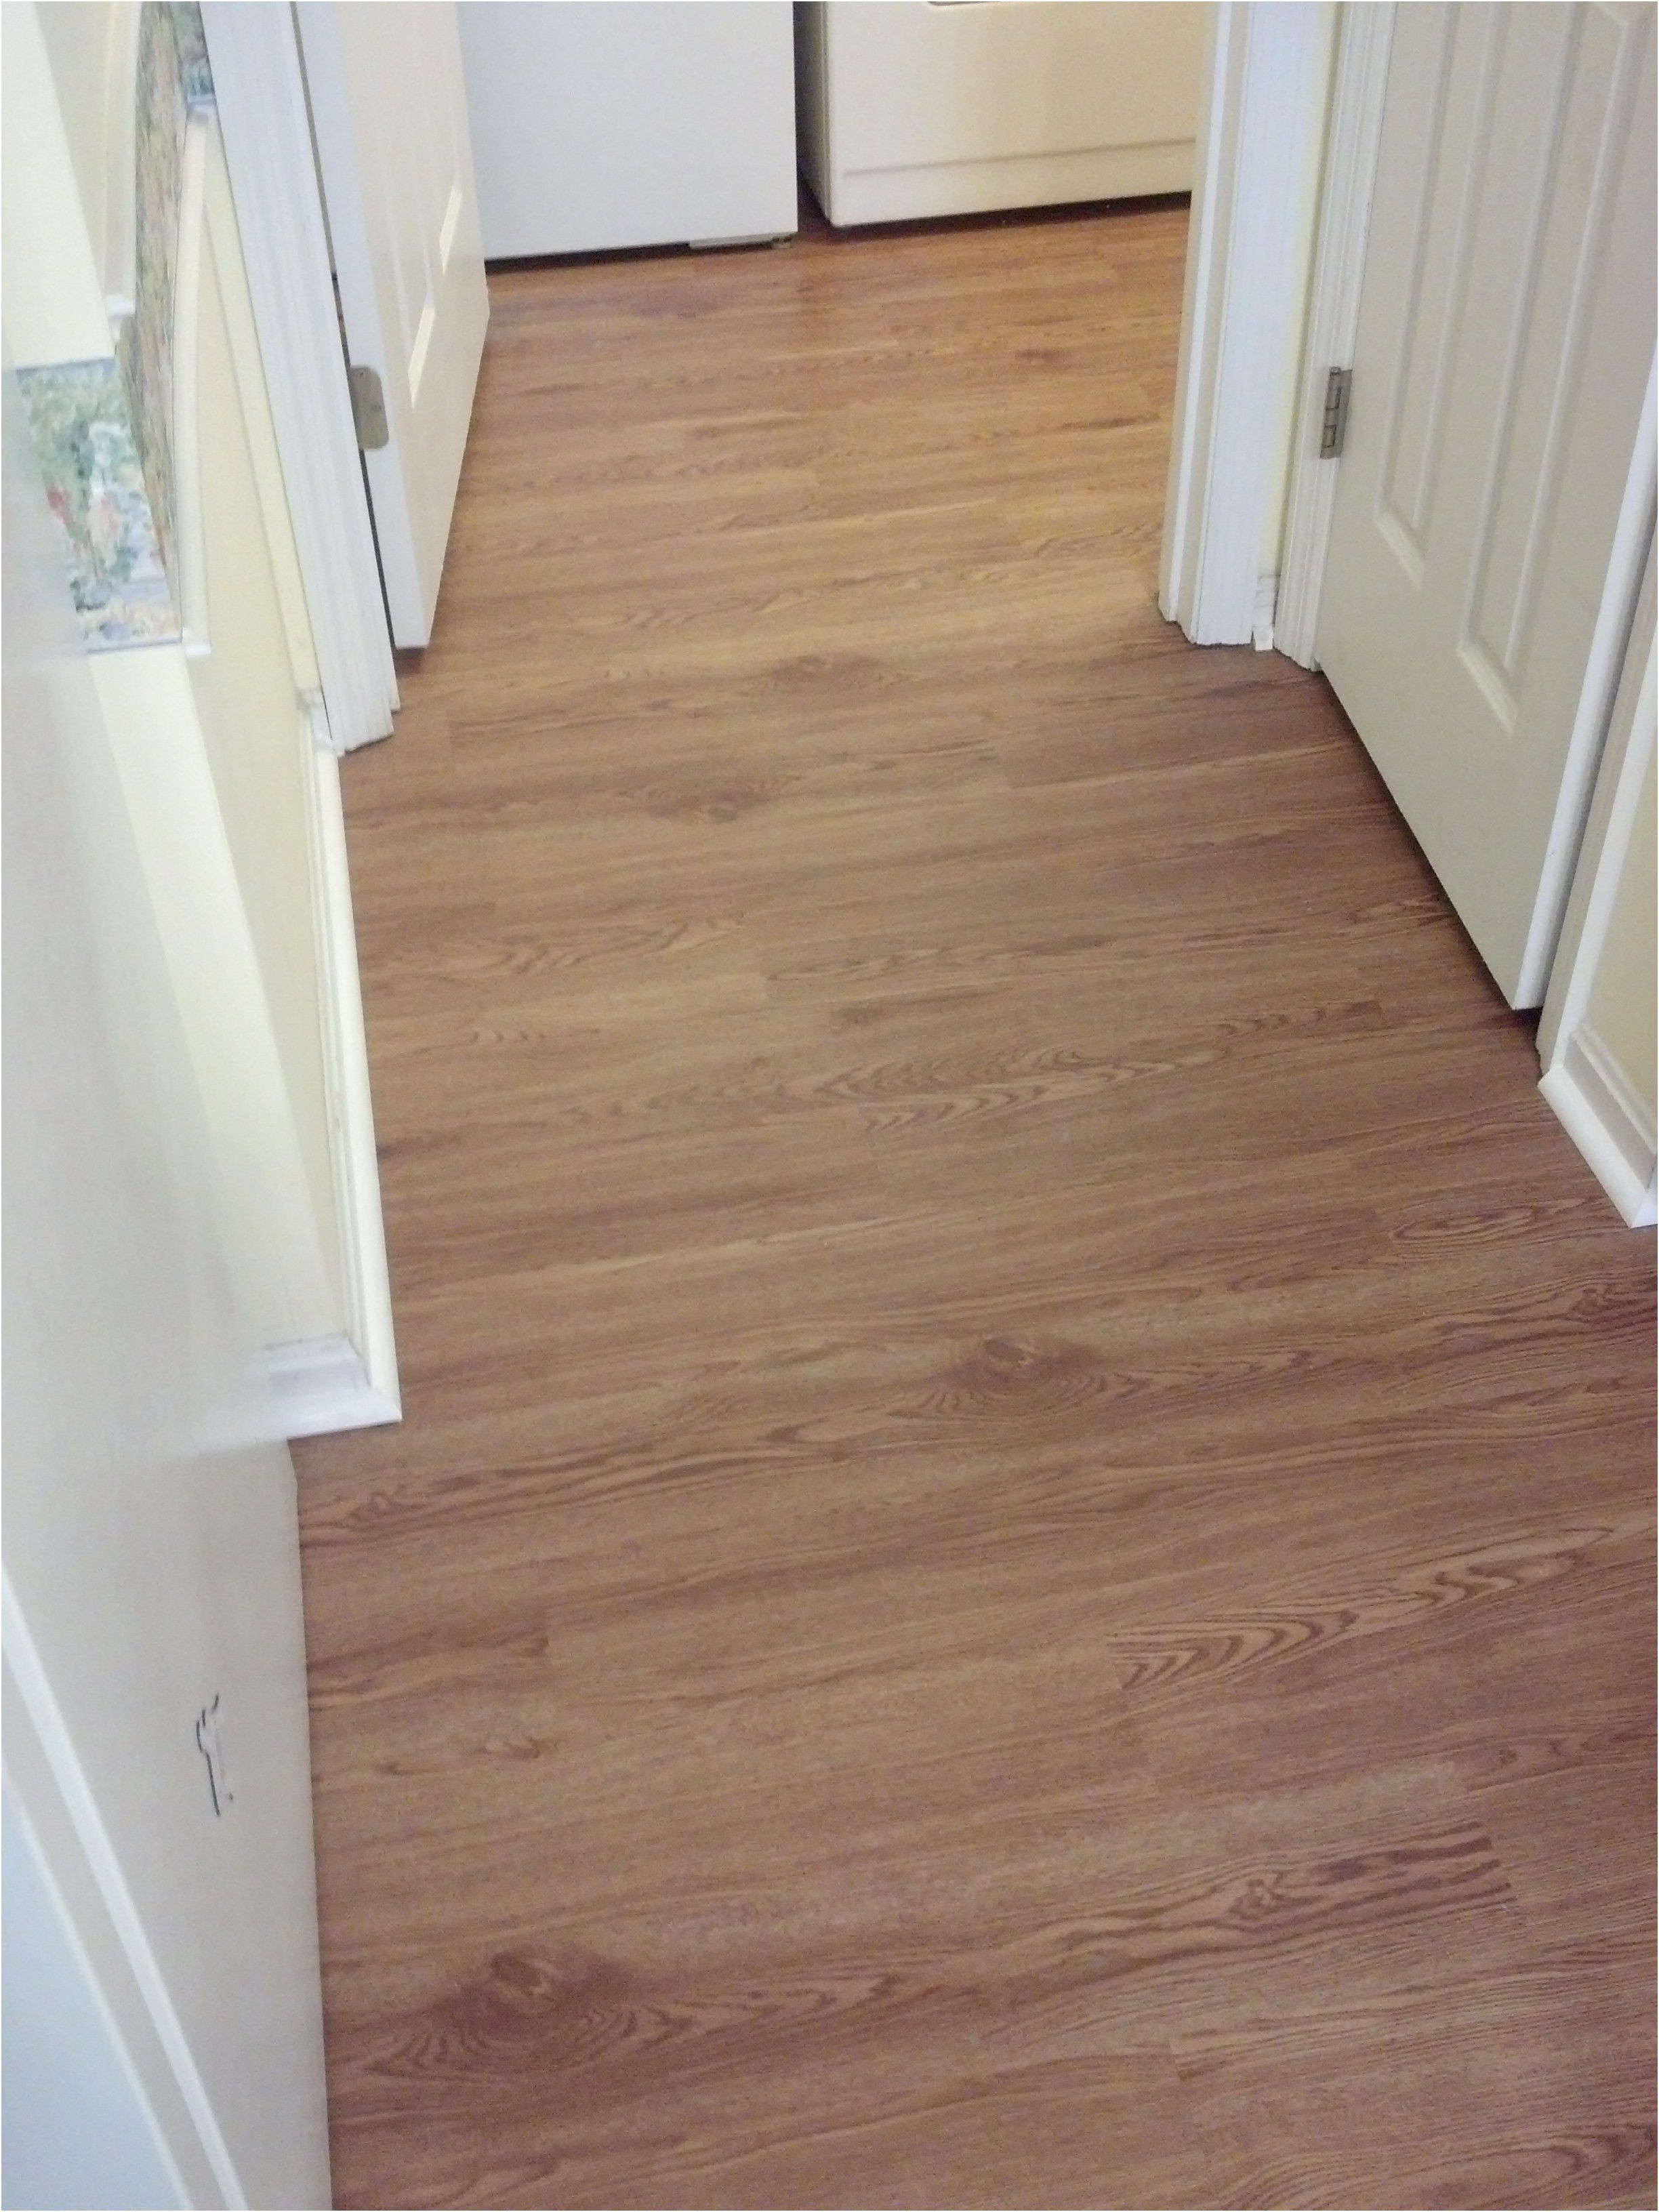 hardwood flooring jobs of wood floor contractors floor plan ideas intended for flooring sale near me stock 0d grace place barnegat nj inspiration flooring sale near me